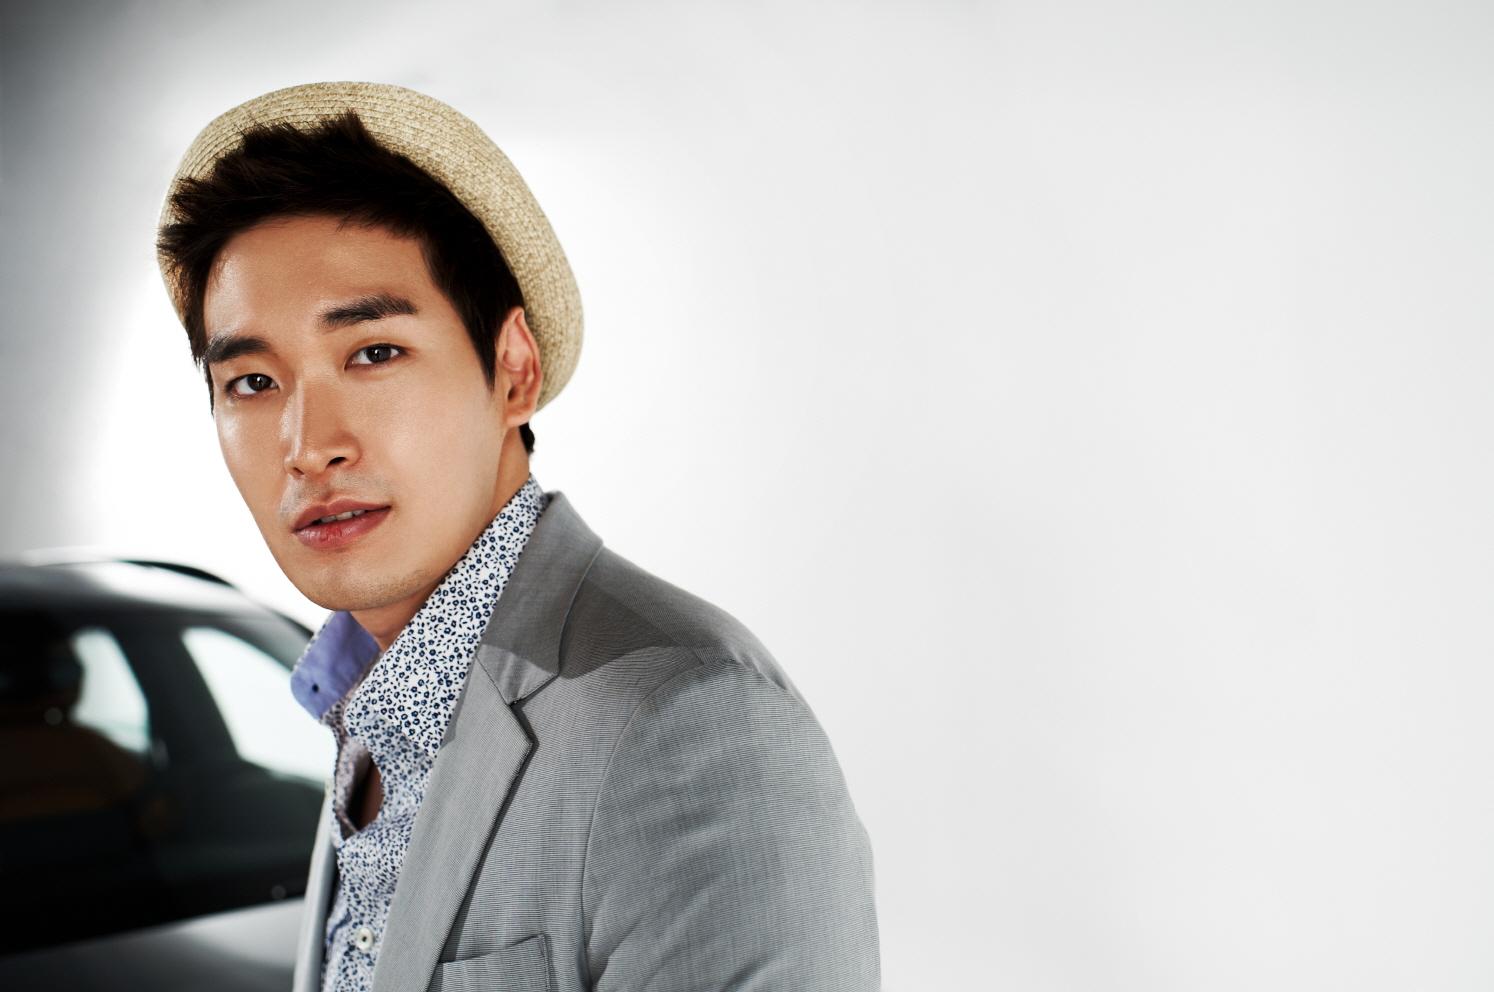 jung gyeo woon 2013